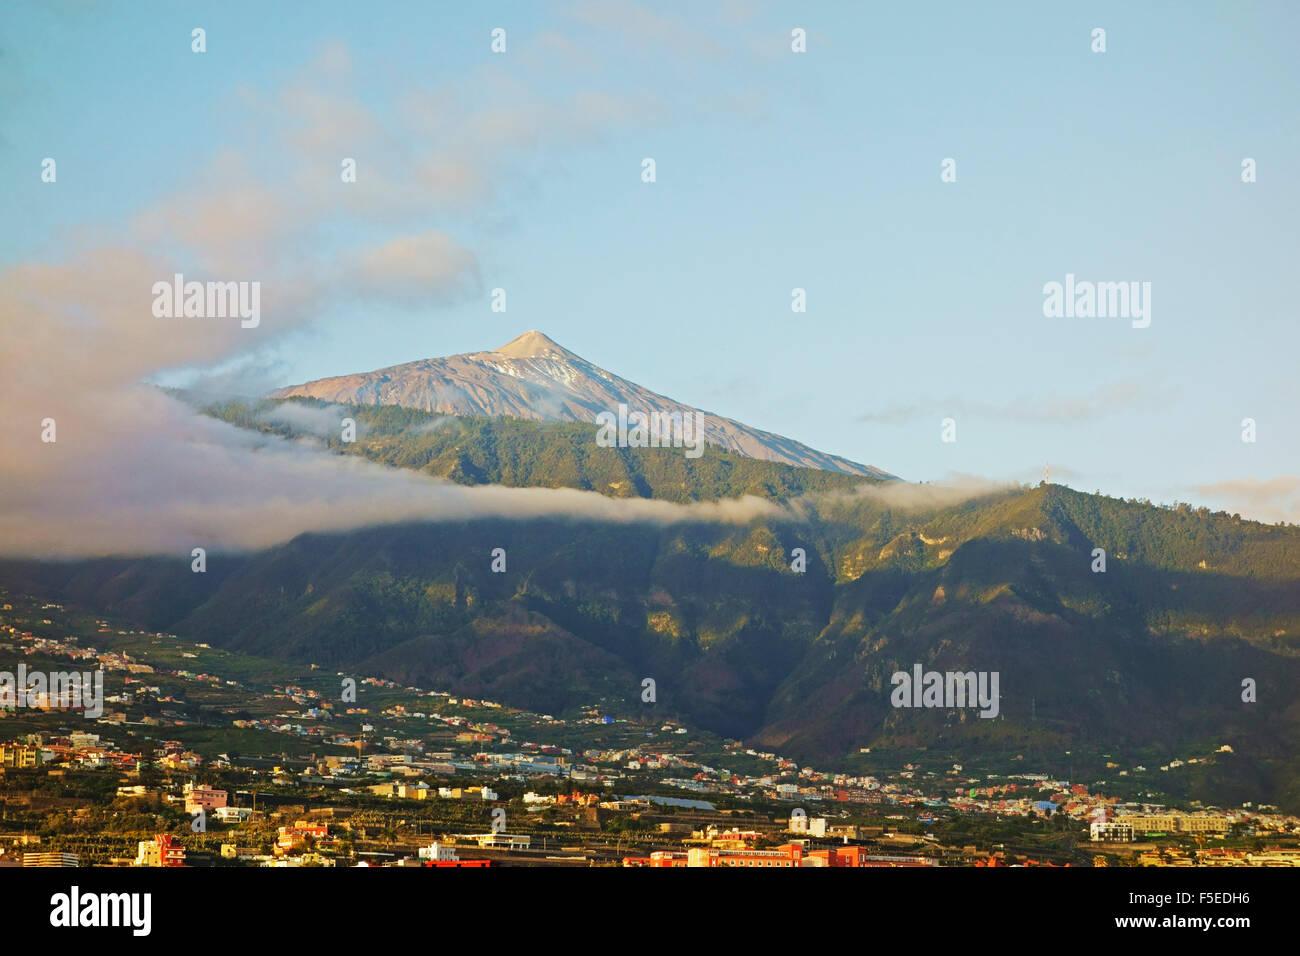 Pico del Teide and Orotava Valley, Tenerife, Canary Islands, Spain, Atlantic, Europe - Stock Image